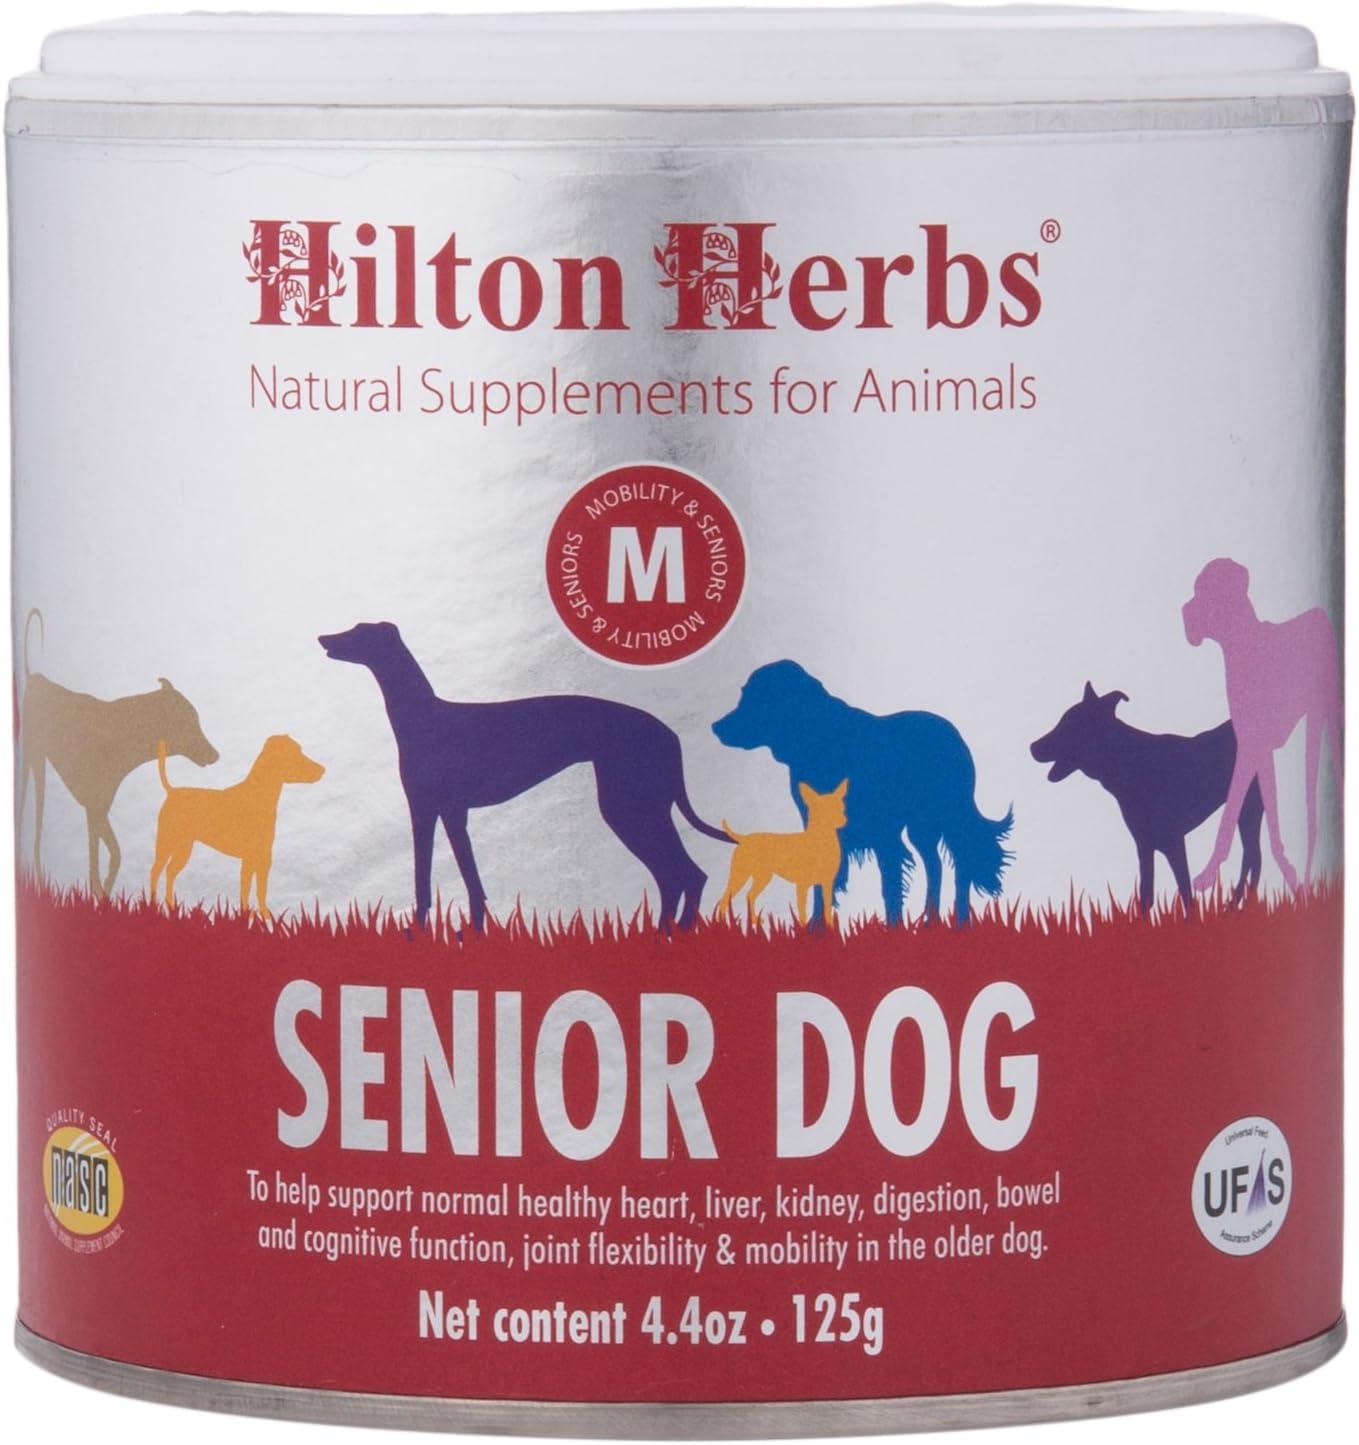 Hilton Herbs Senior Dog Optimum Health Supplement for Older Dogs, 4.4 oz Tub